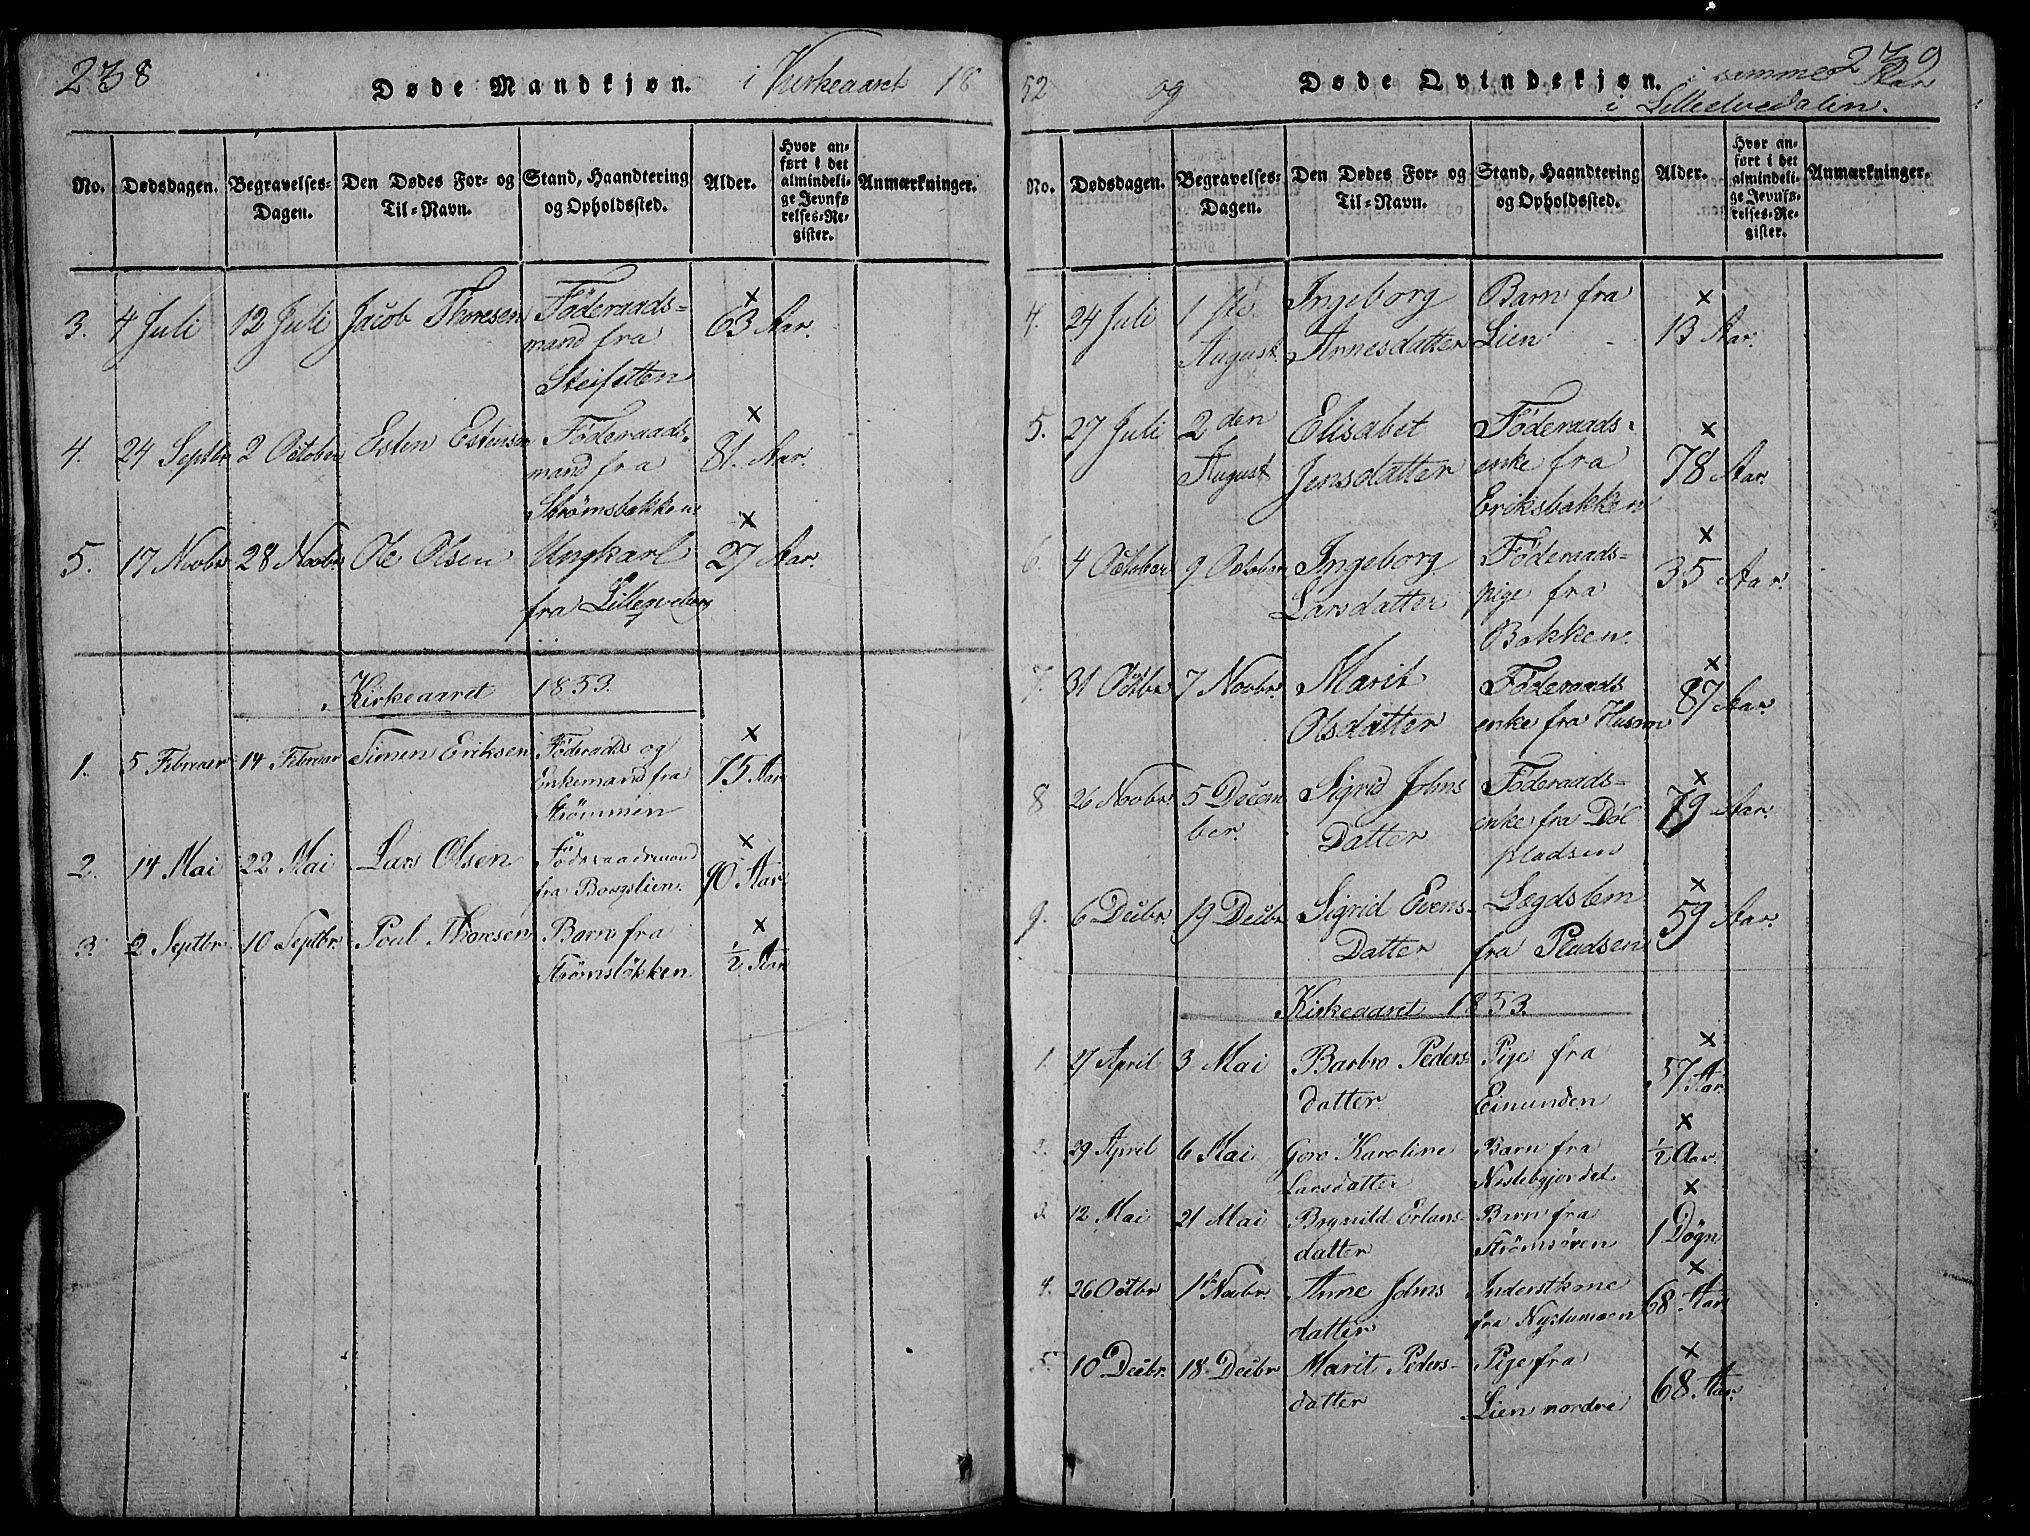 SAH, Tynset prestekontor, Klokkerbok nr. 2, 1814-1862, s. 238-239